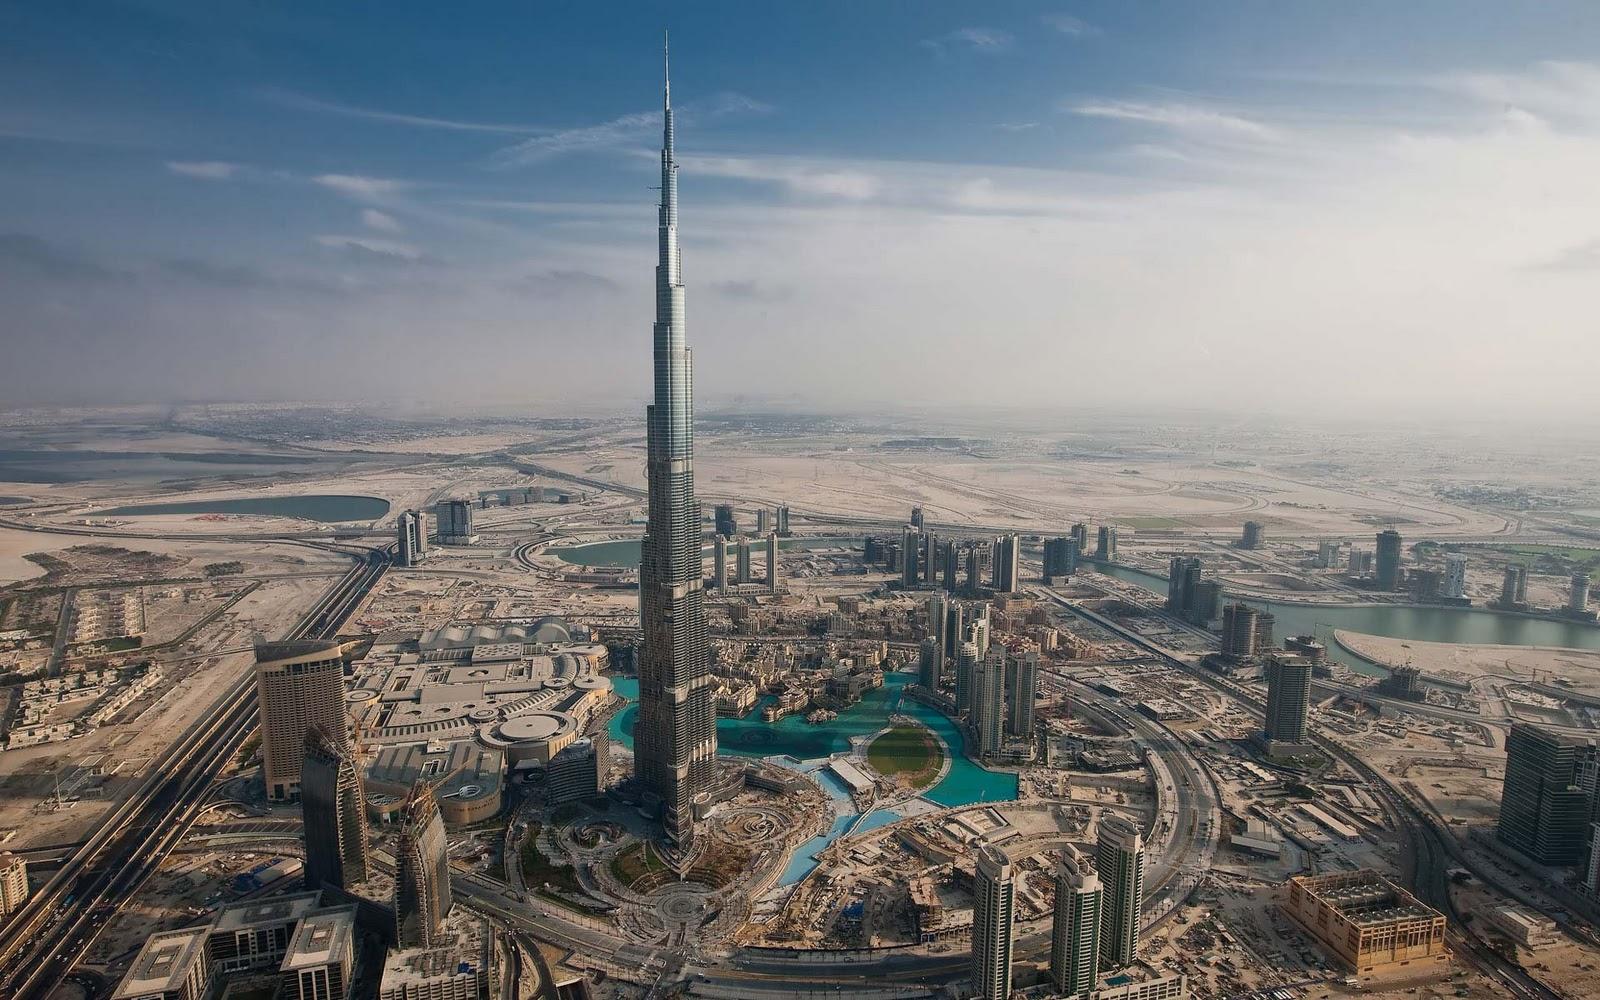 http://3.bp.blogspot.com/_XF_J0xP6x-w/TTtLv-UrfWI/AAAAAAAAAp8/NHiPp3CHRHM/s1600/Burj_Khalifa_Khalifa_Tower_Dubai_United_Arab_Emirates_hd_wallpaper.jpg